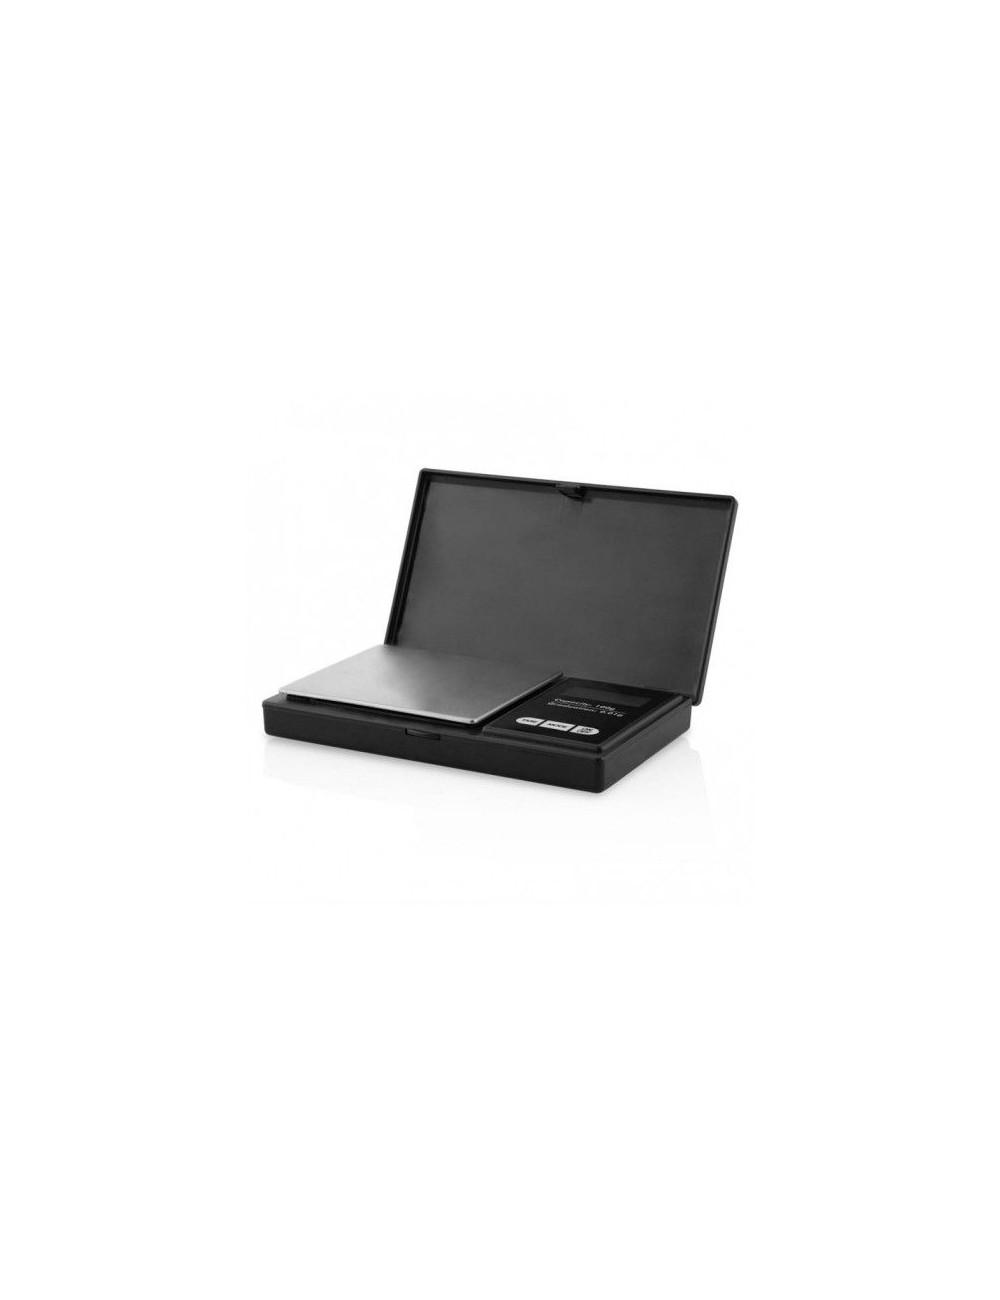 Báscula de precisión Orbegozo PC 3050 Pantalla LCD Inox